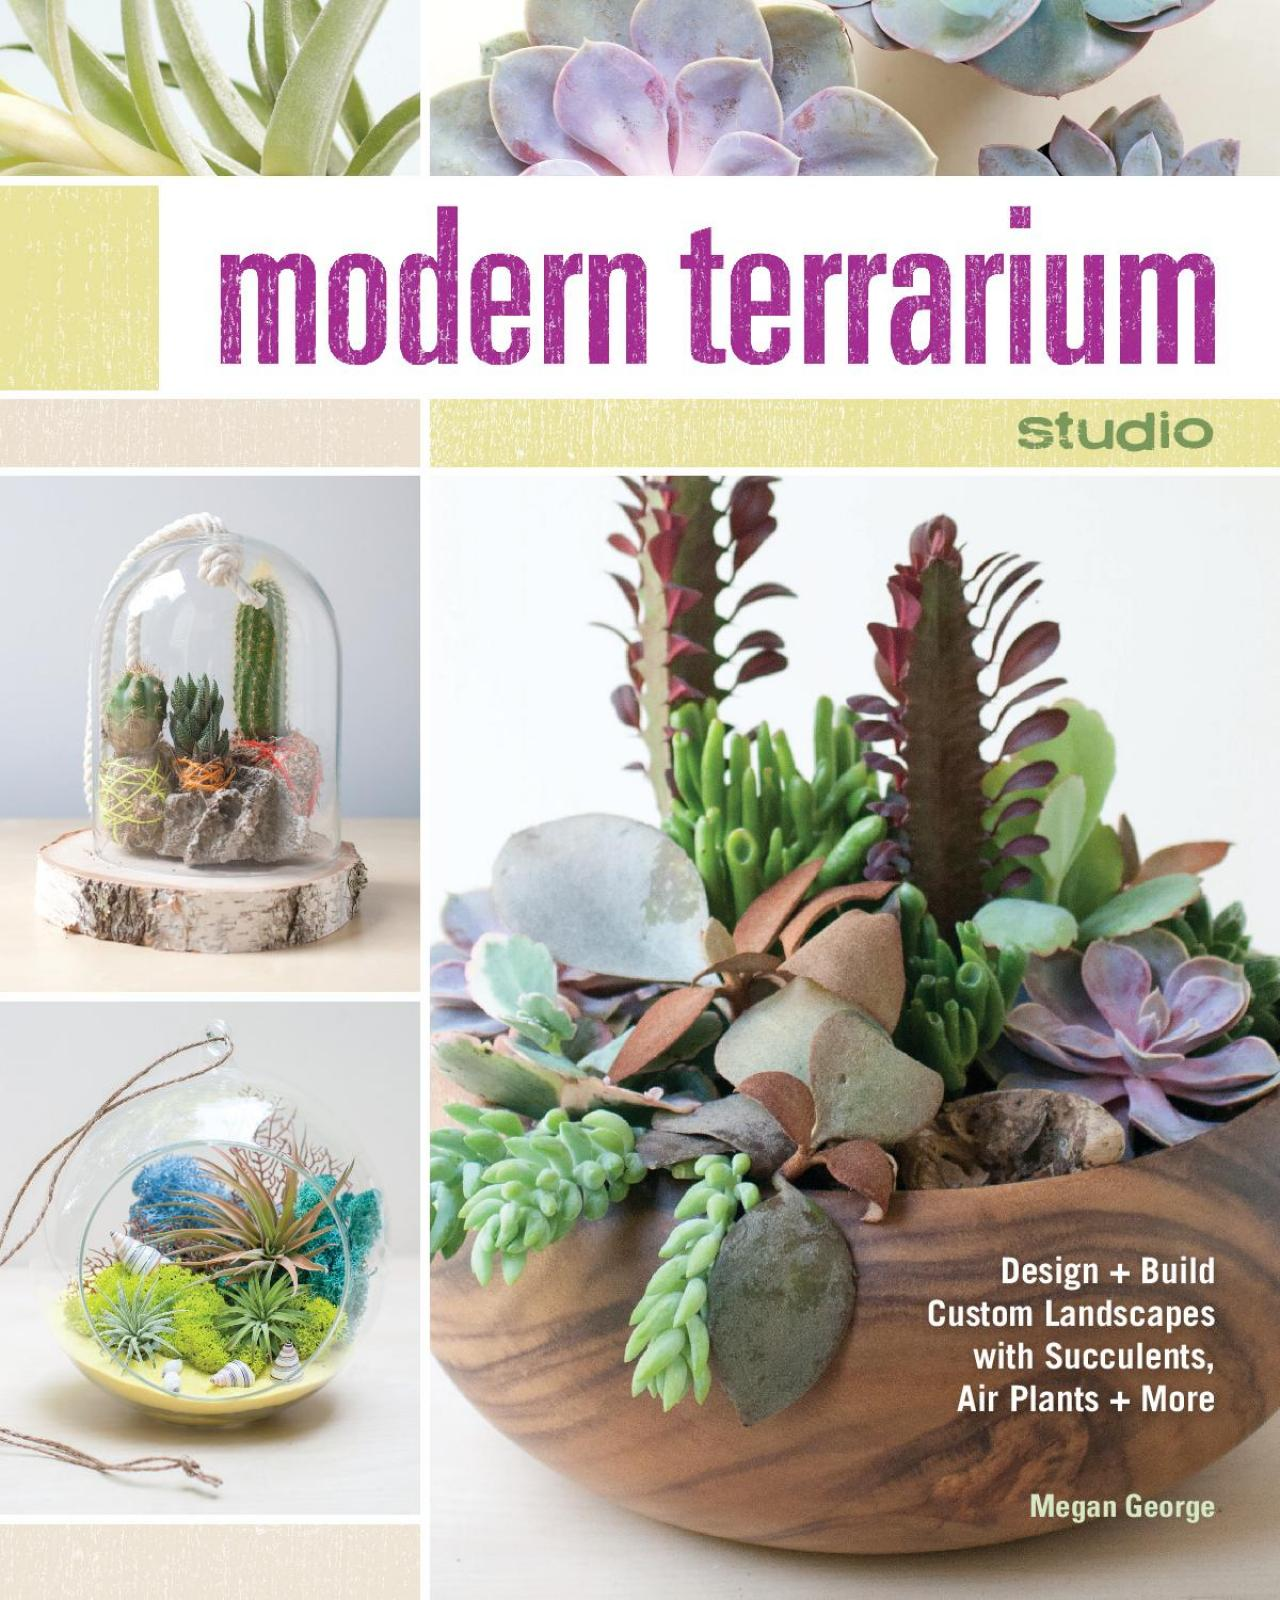 how to make a tabletop succulent terrarium diy network blog